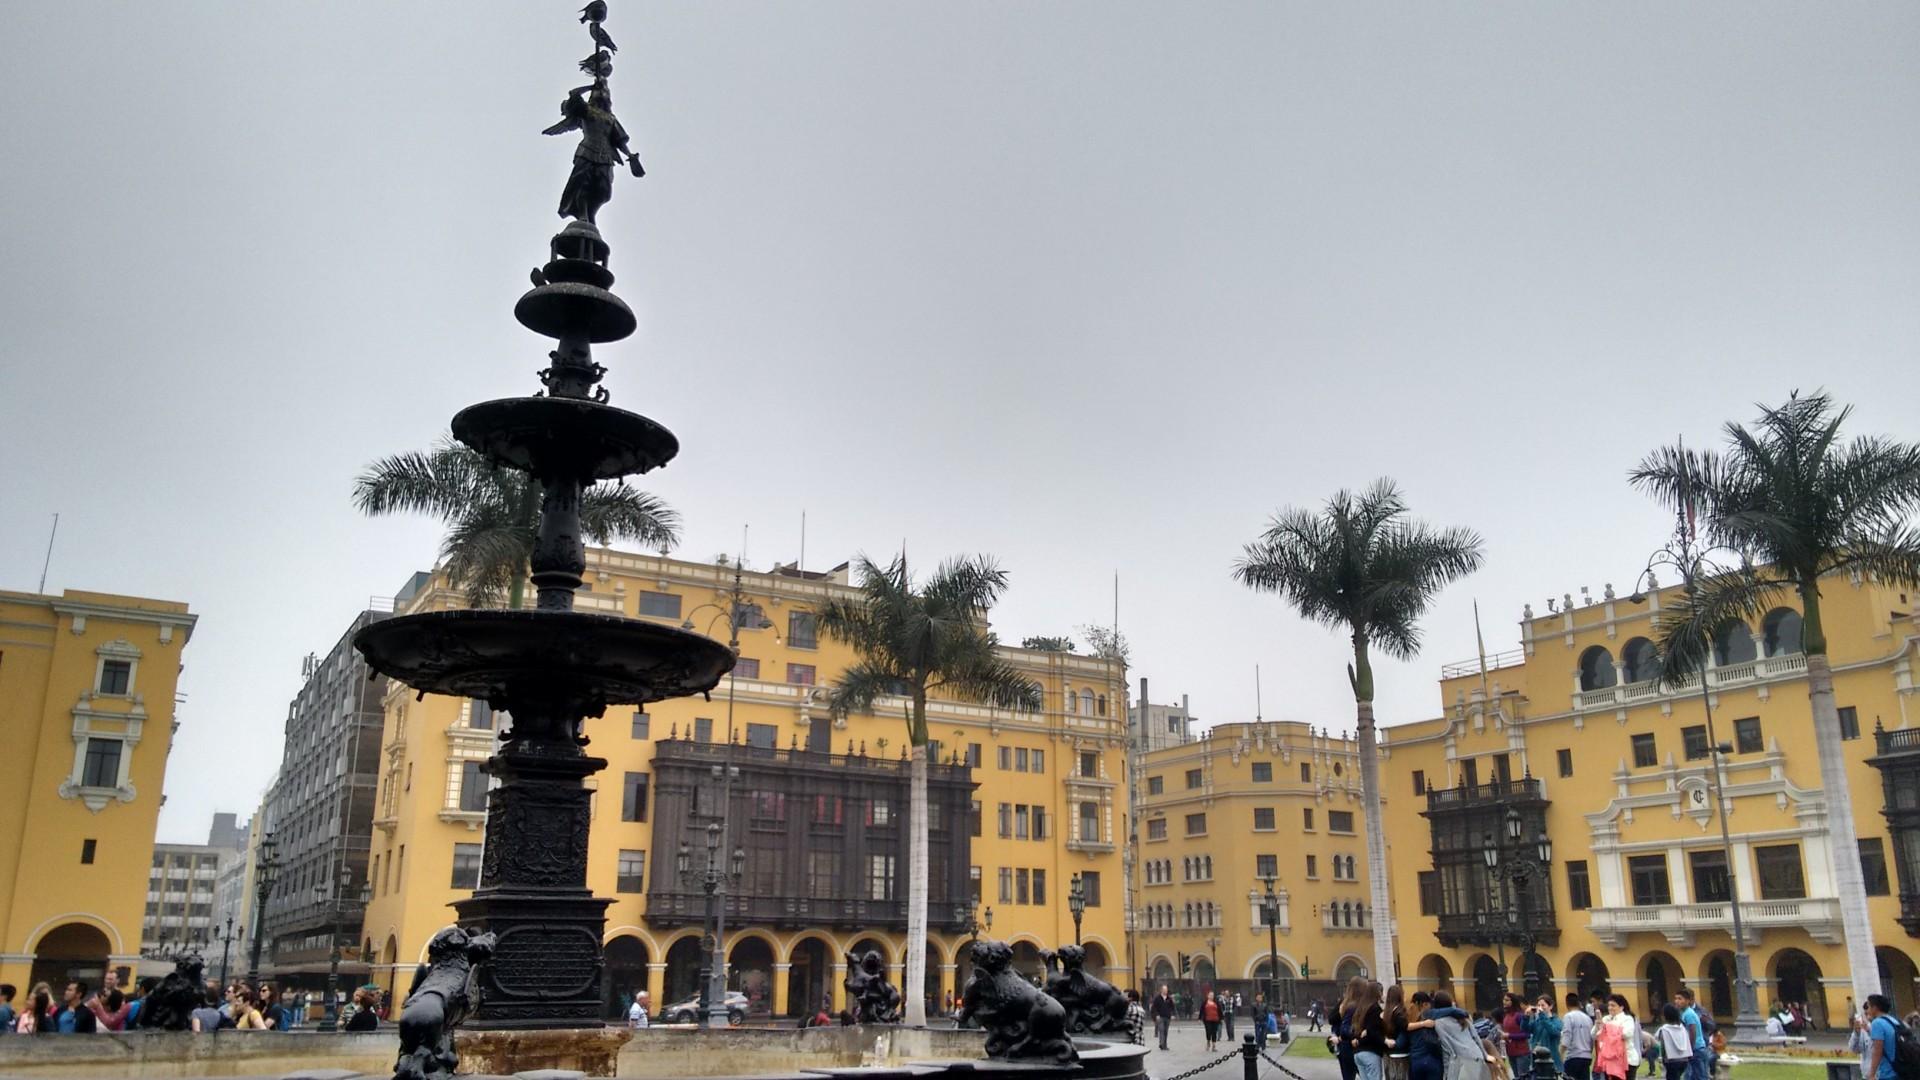 Lima's plaza de armas.